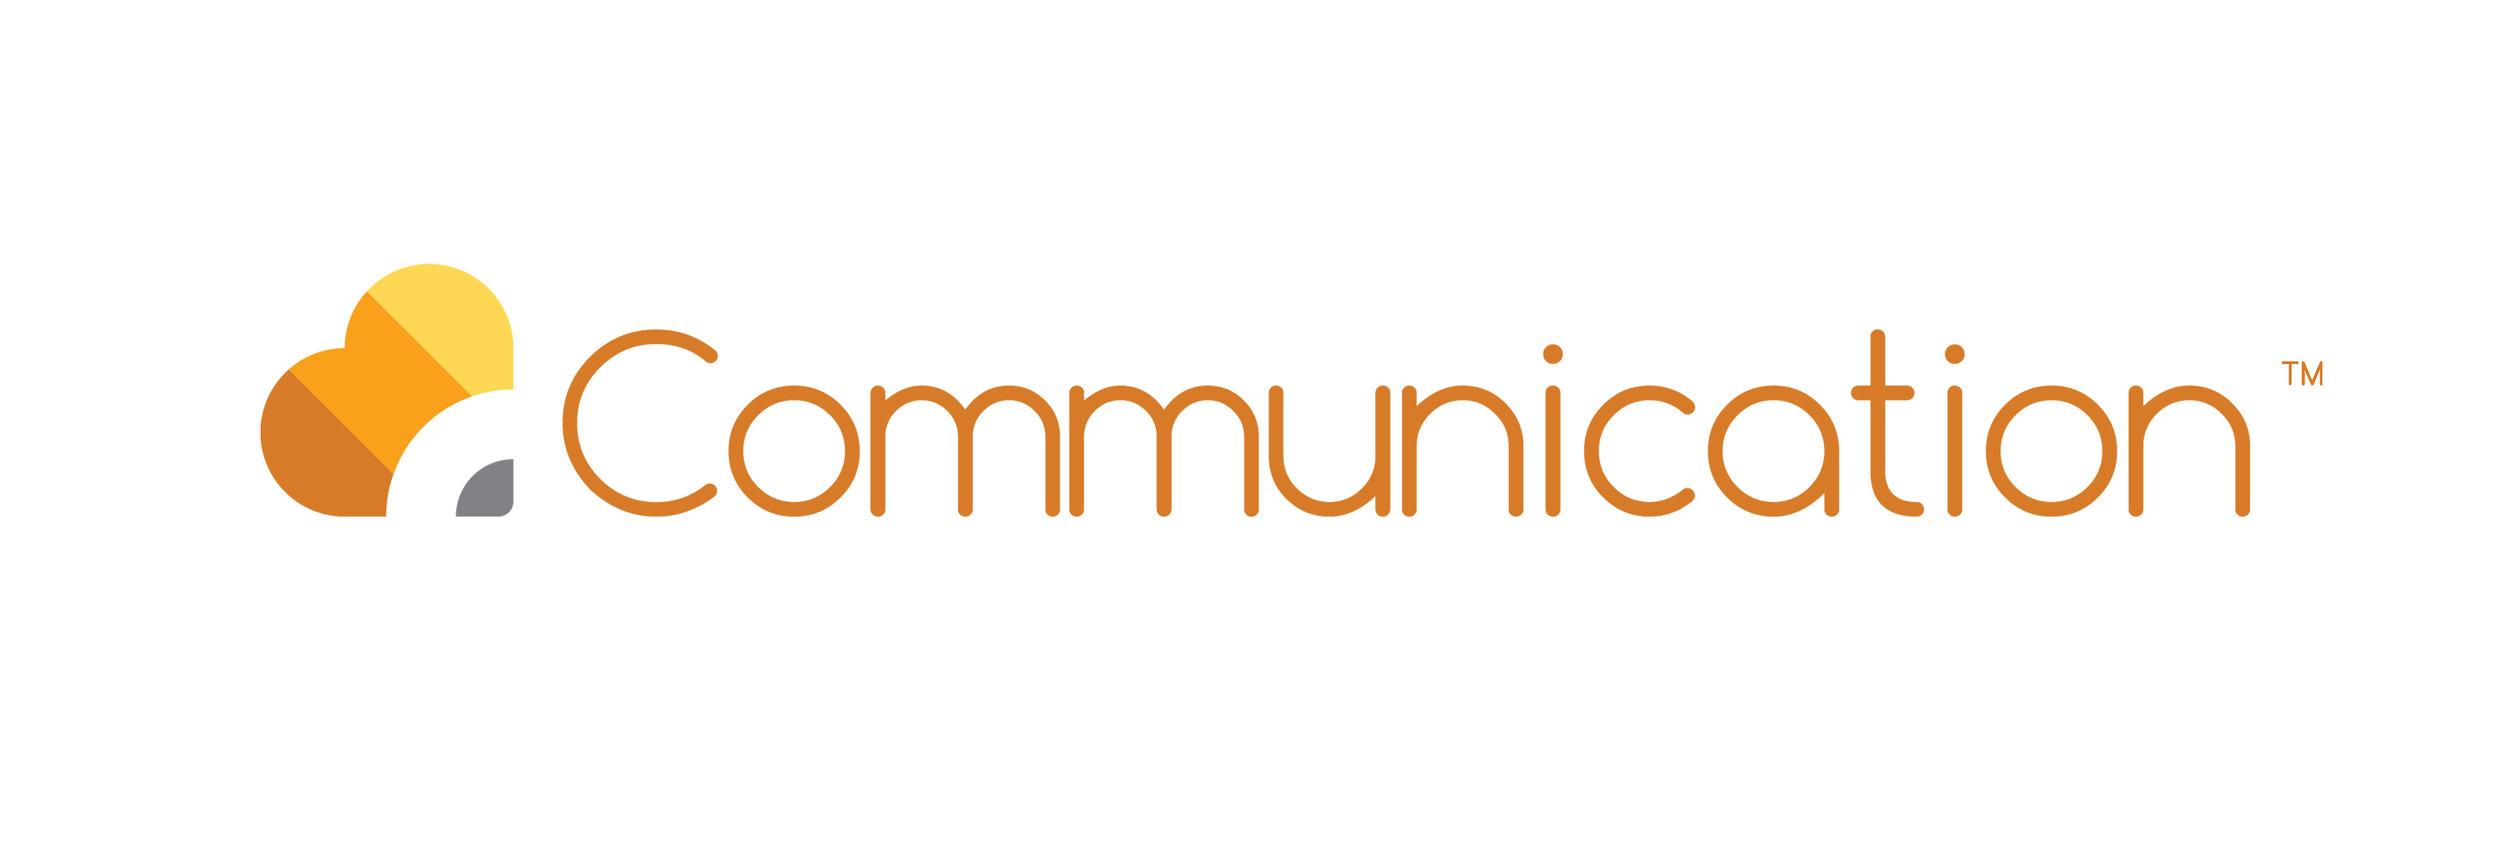 communication logo.jpg